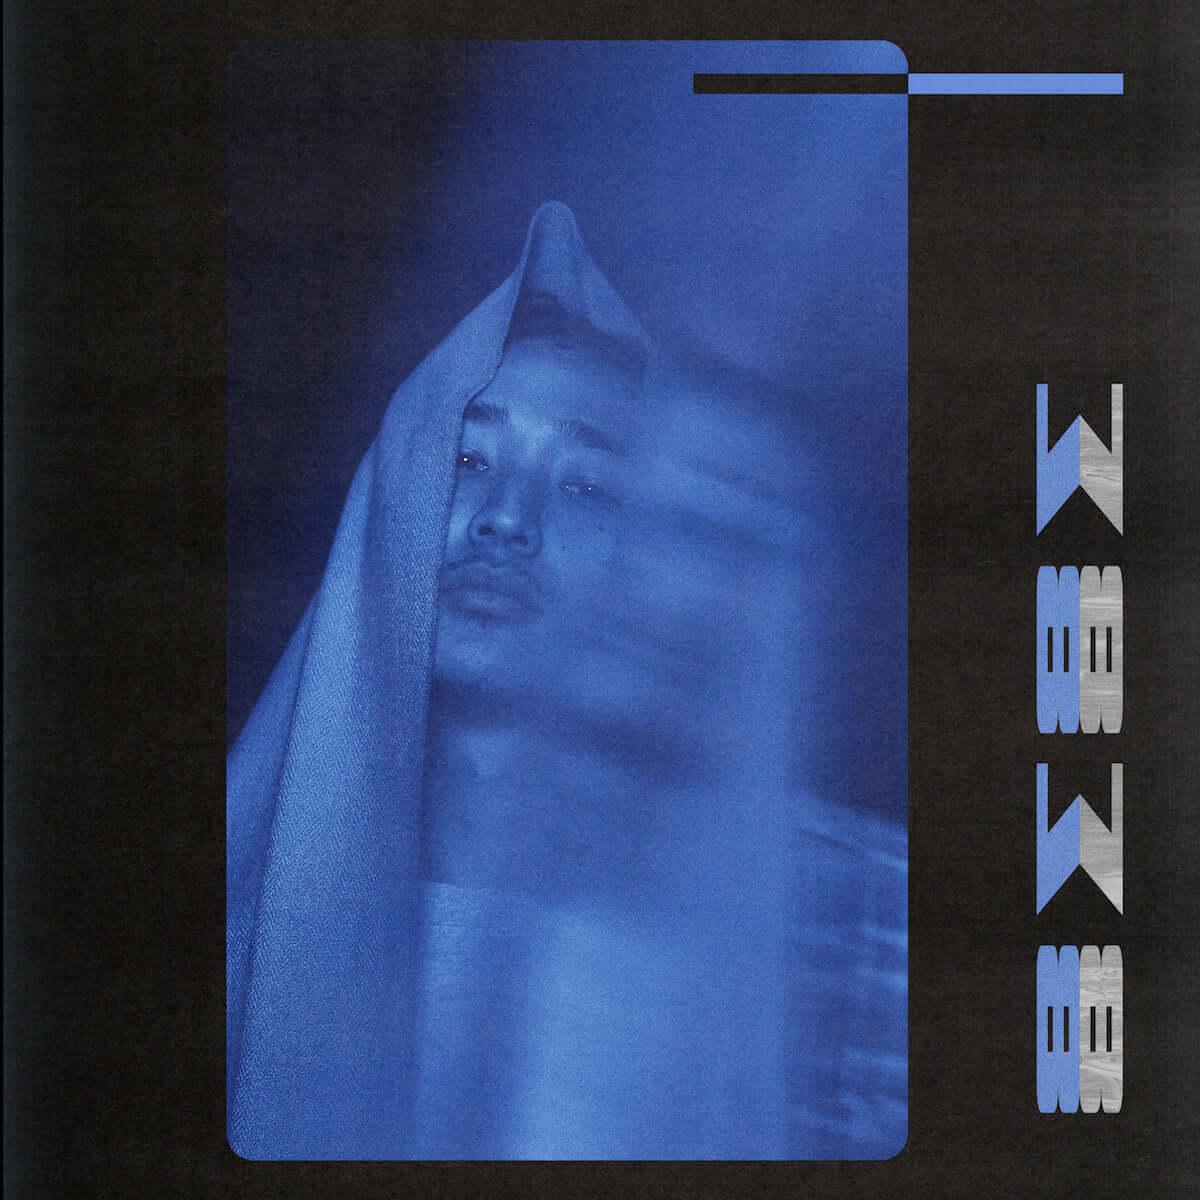 Yo-Seaが、Chaki Zuluをプロデューサーに迎えた楽曲「LOOK AT ME NOW」のMVを公開 music190404_yosea_1-1200x1200